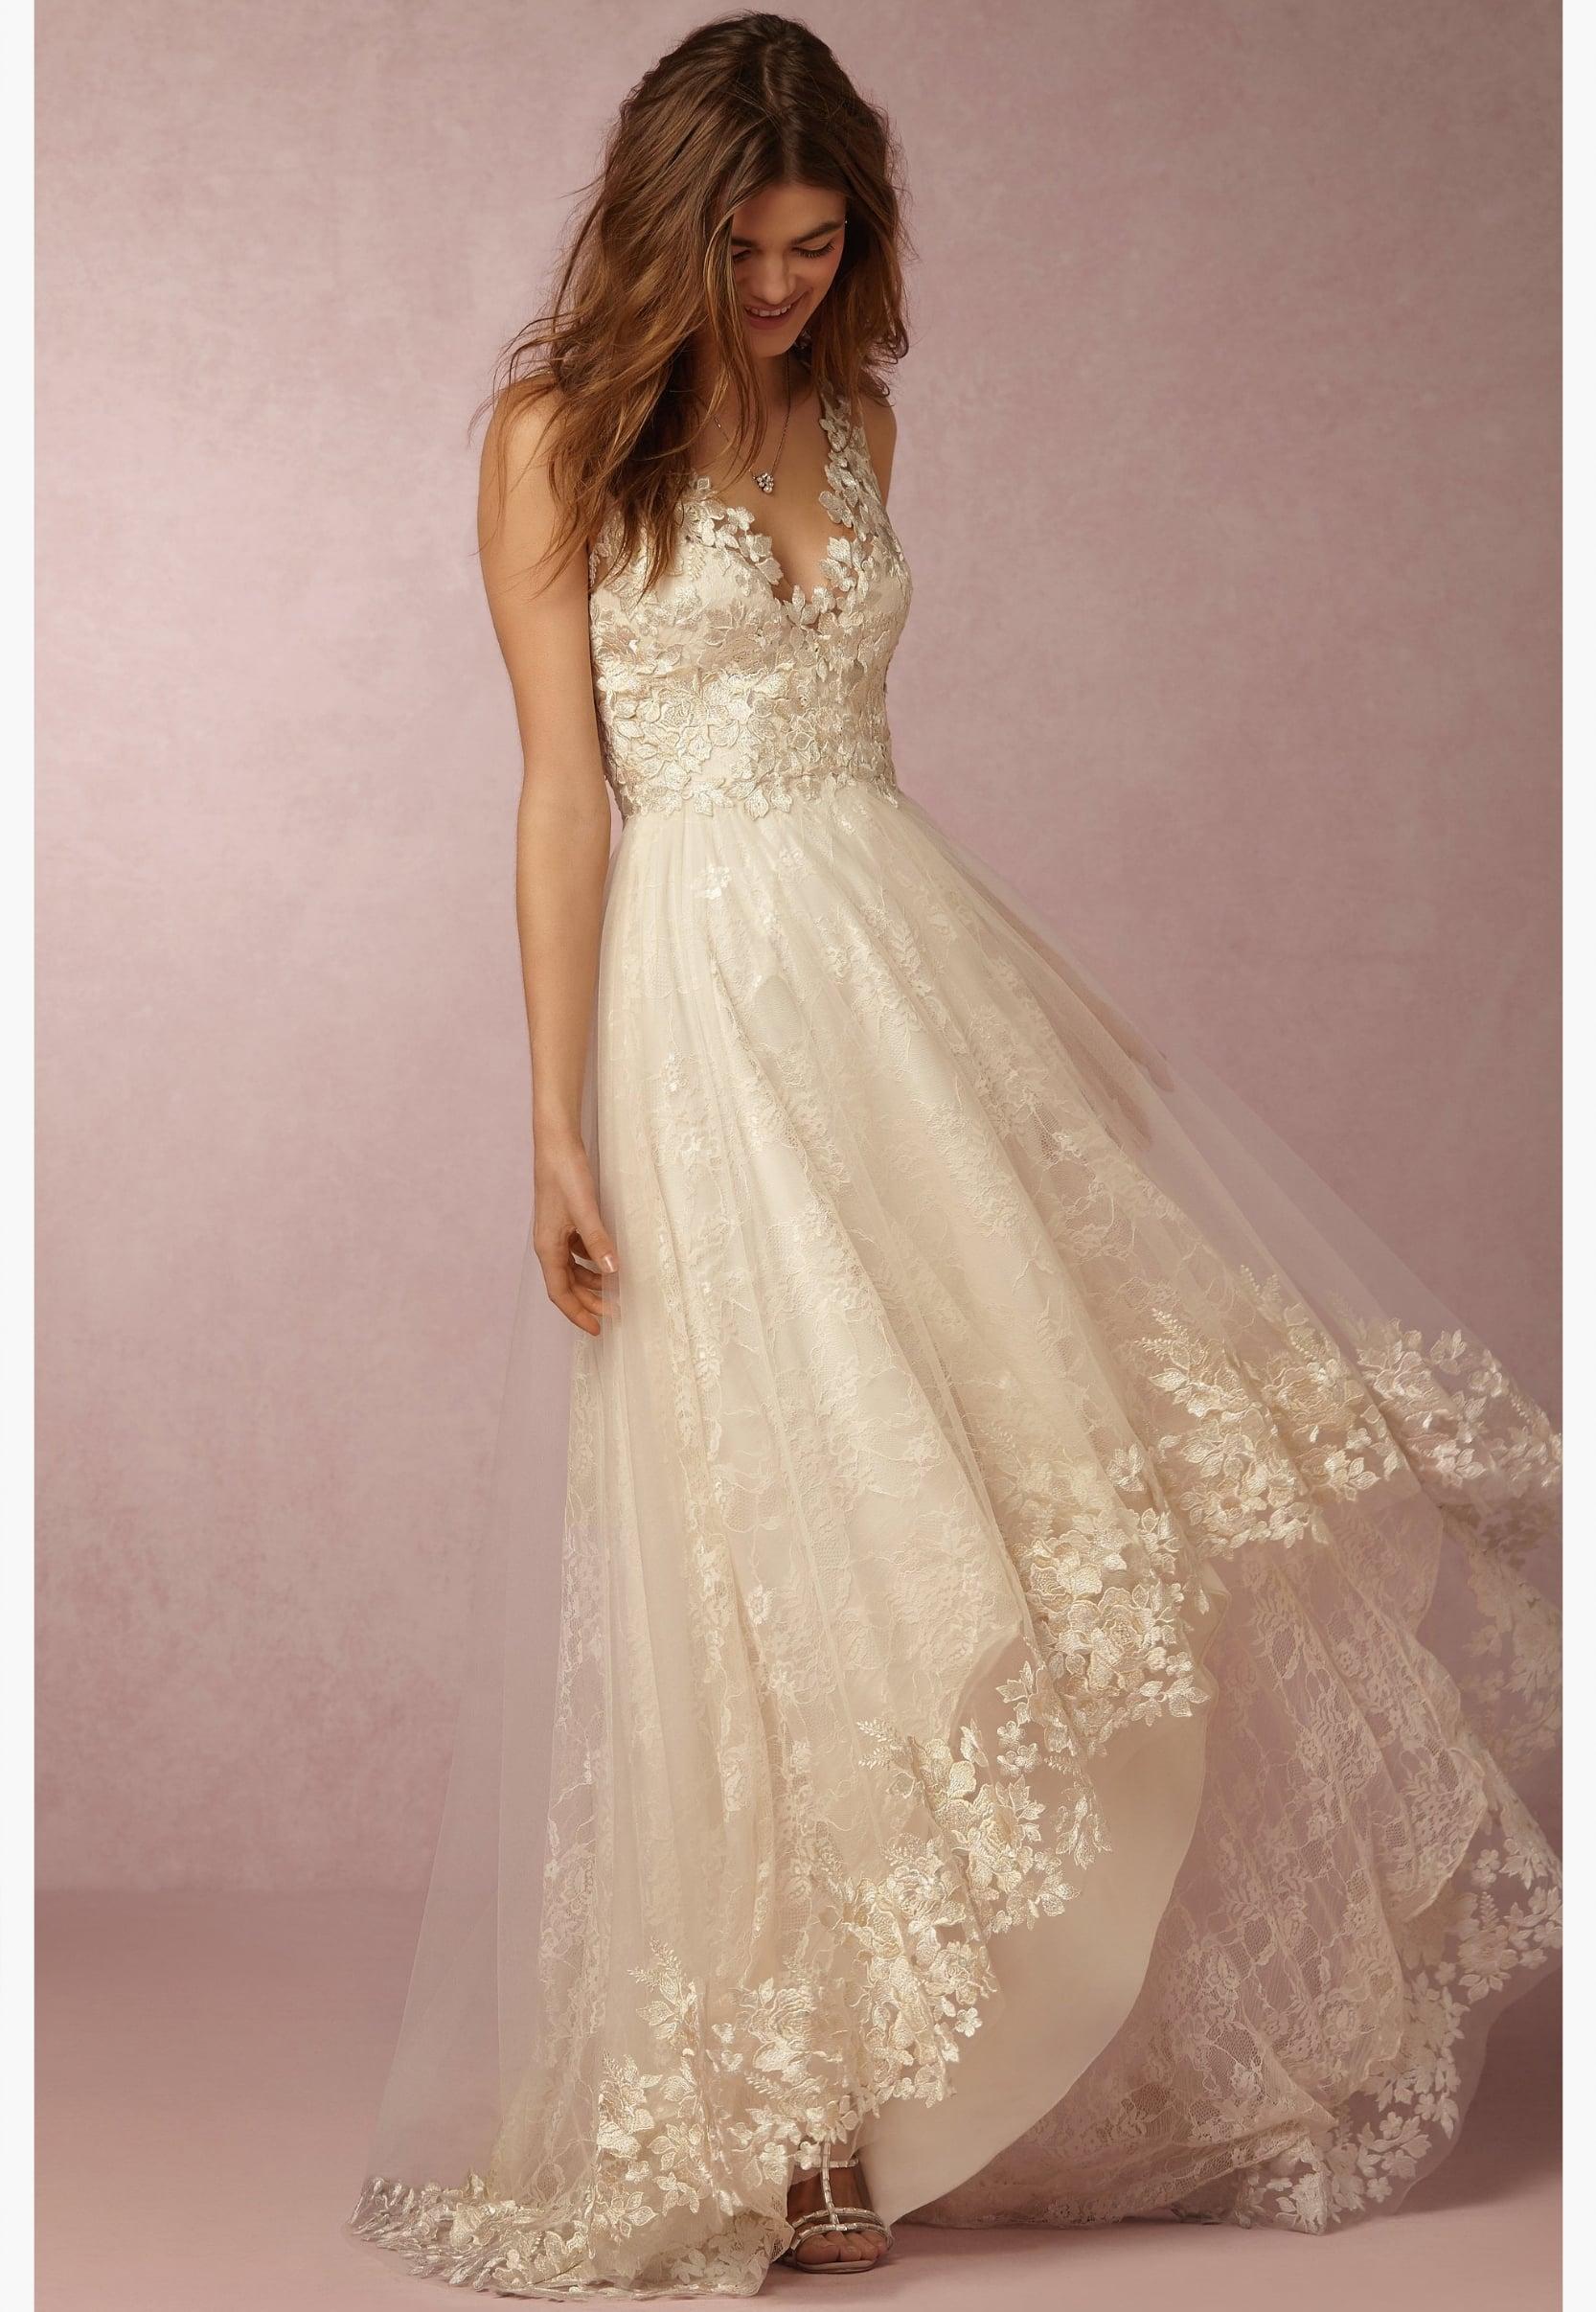 Opal-Gown-2200.jpg